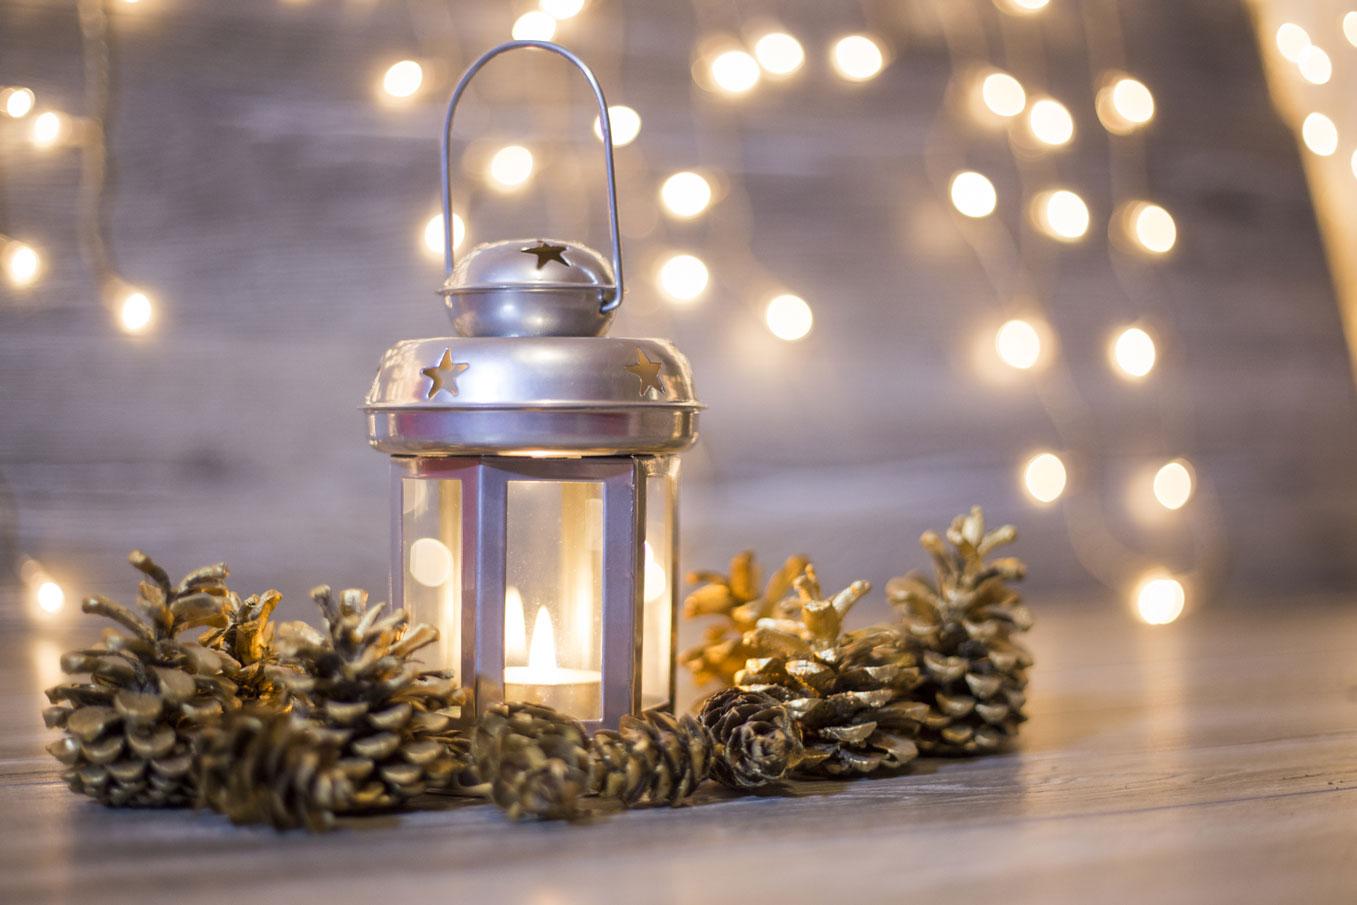 Christmas-lantern-000079205909_Medium.jpg